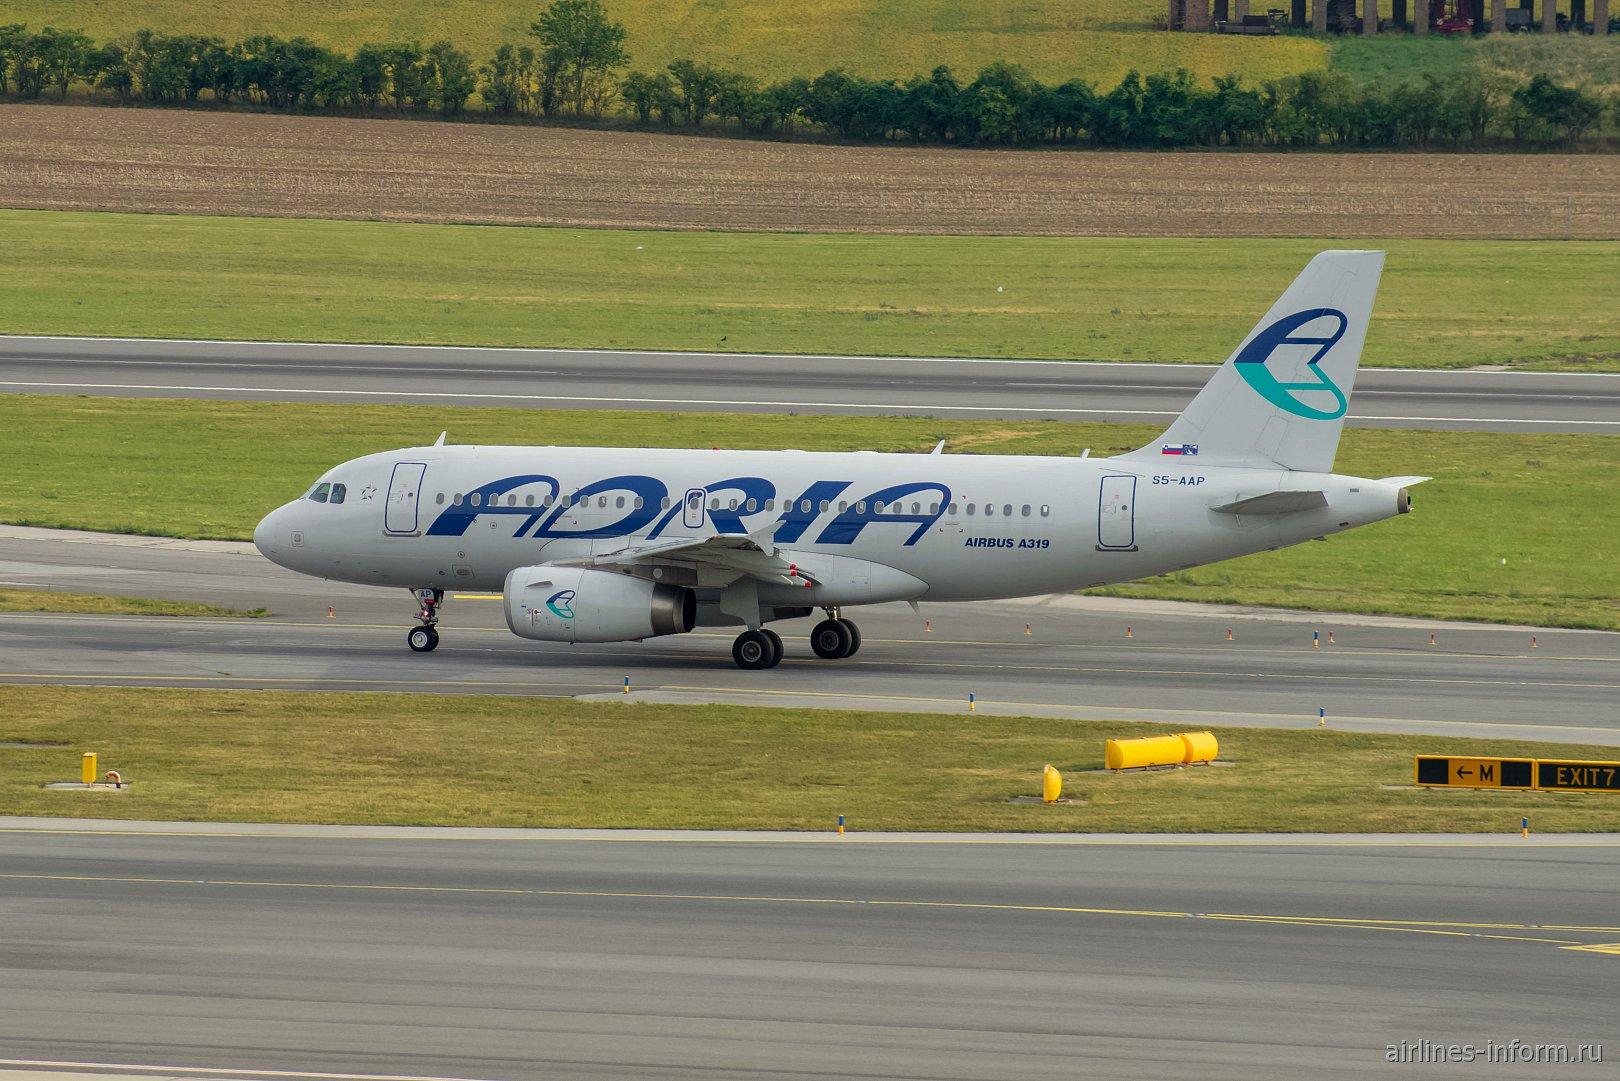 Airbus A319 S5-AAP авиакомпании Adria в аэропорту Вена Швехат